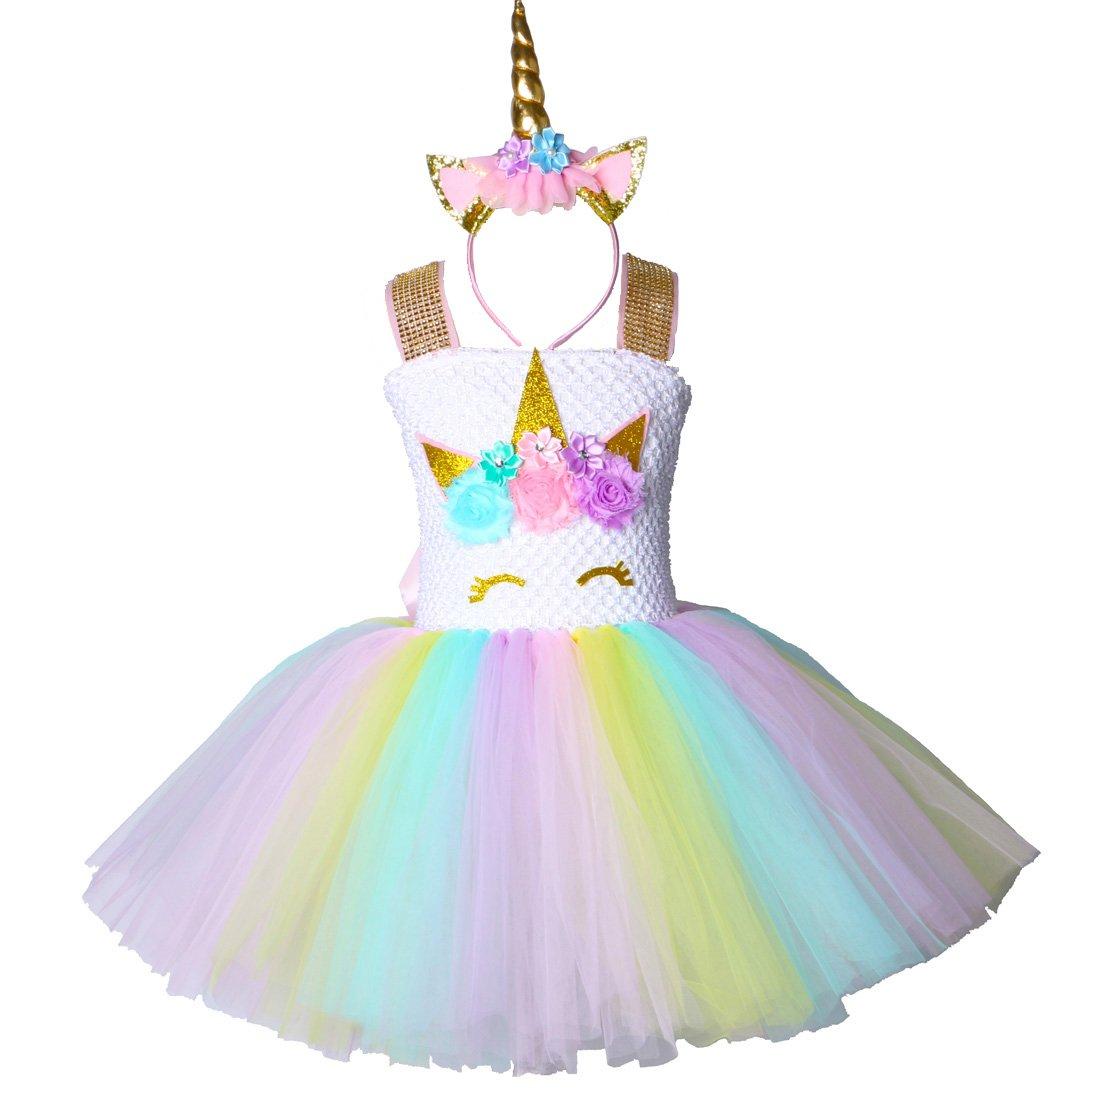 Pastel Unicorn Tutu Dress for Girls Kids Birthday Party Unicorn Costume Outfit with Headband Size 5T 6T